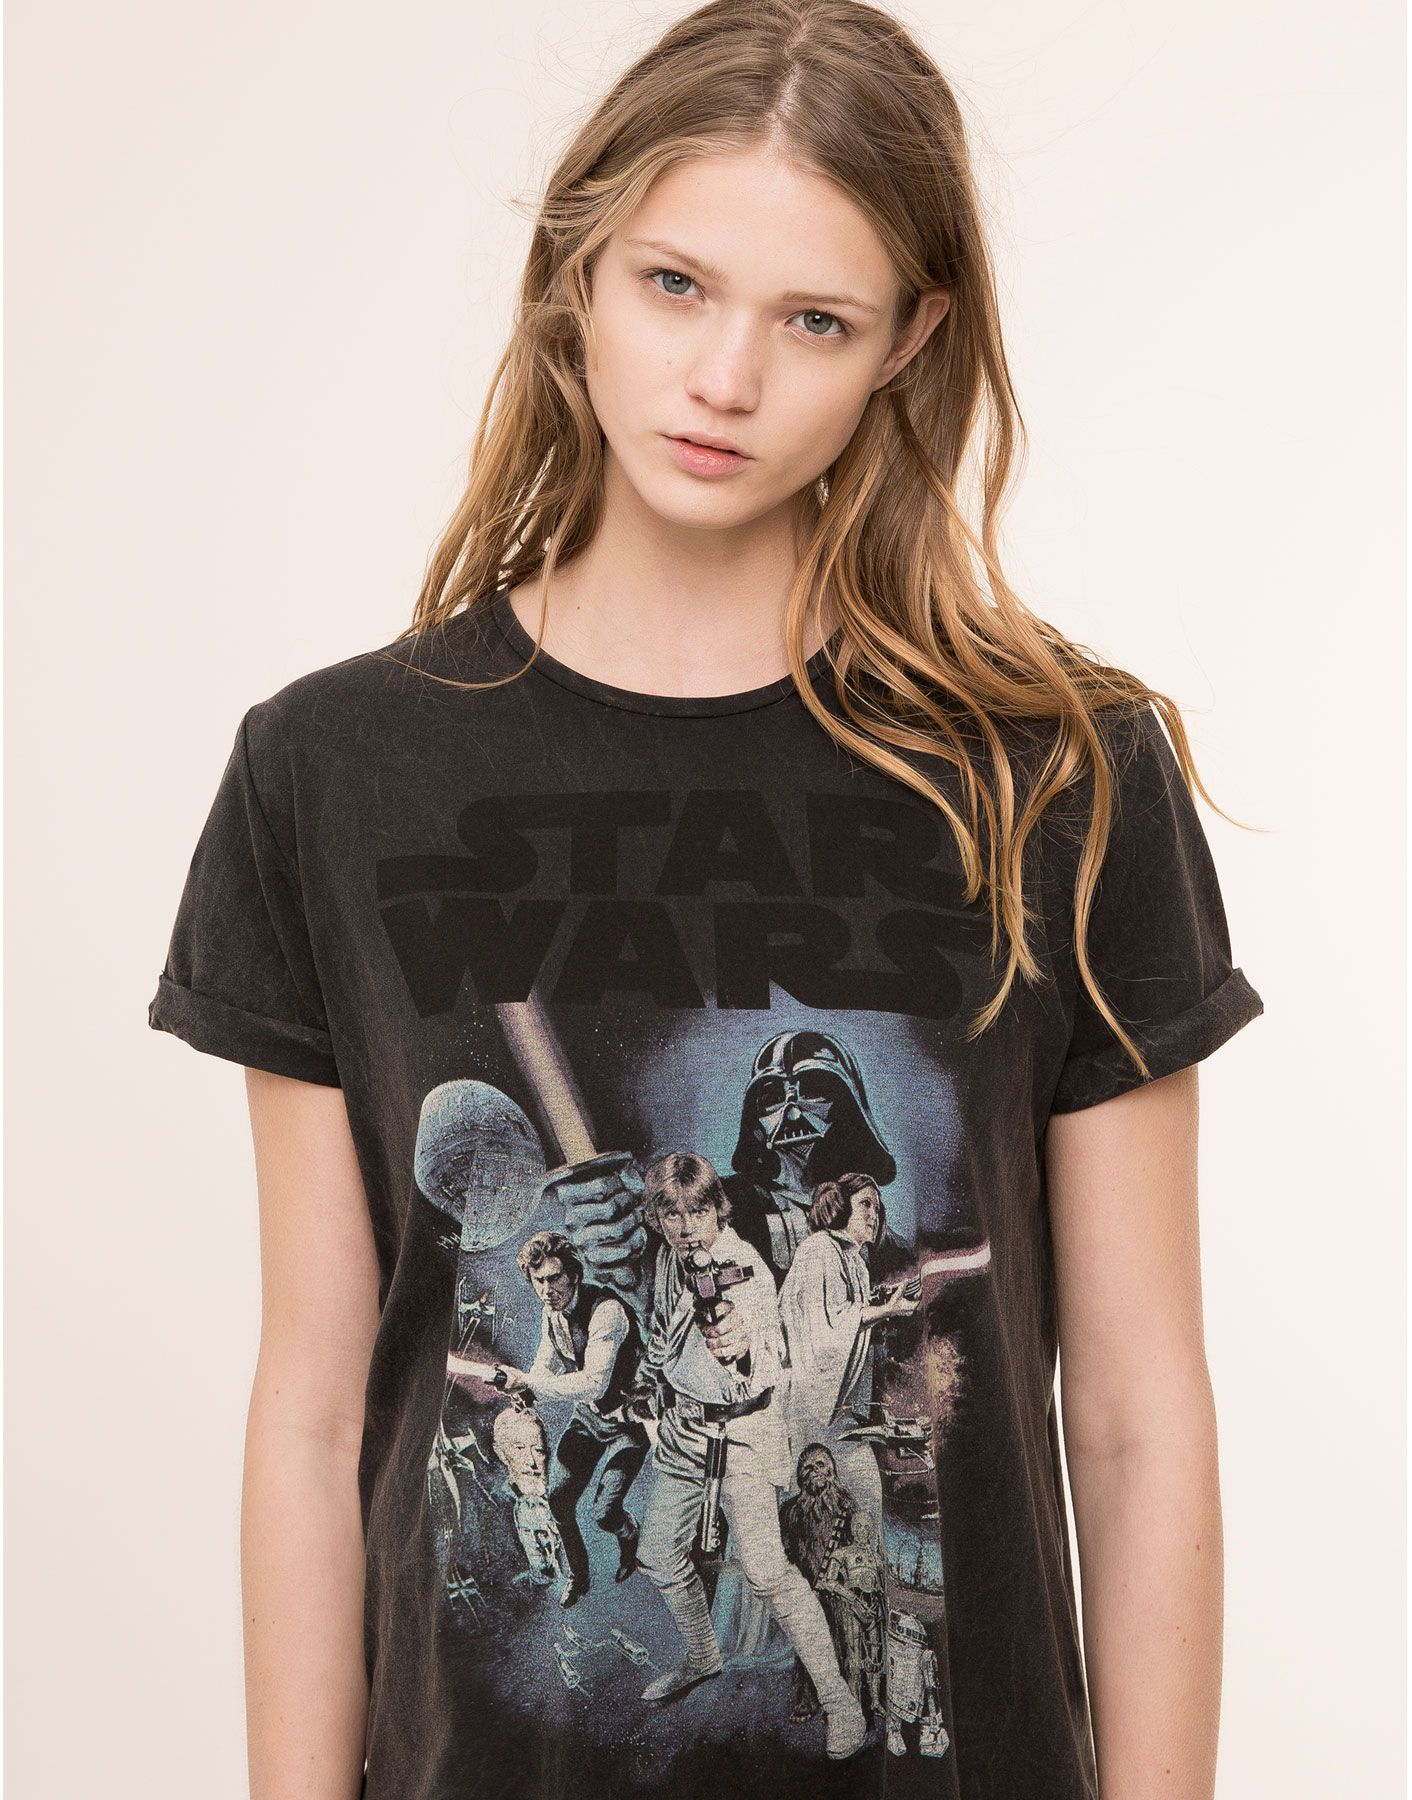 Mujer Camiseta Star España Tops amp;bear Camisetas Pull Wars Y gvfIY6b7y